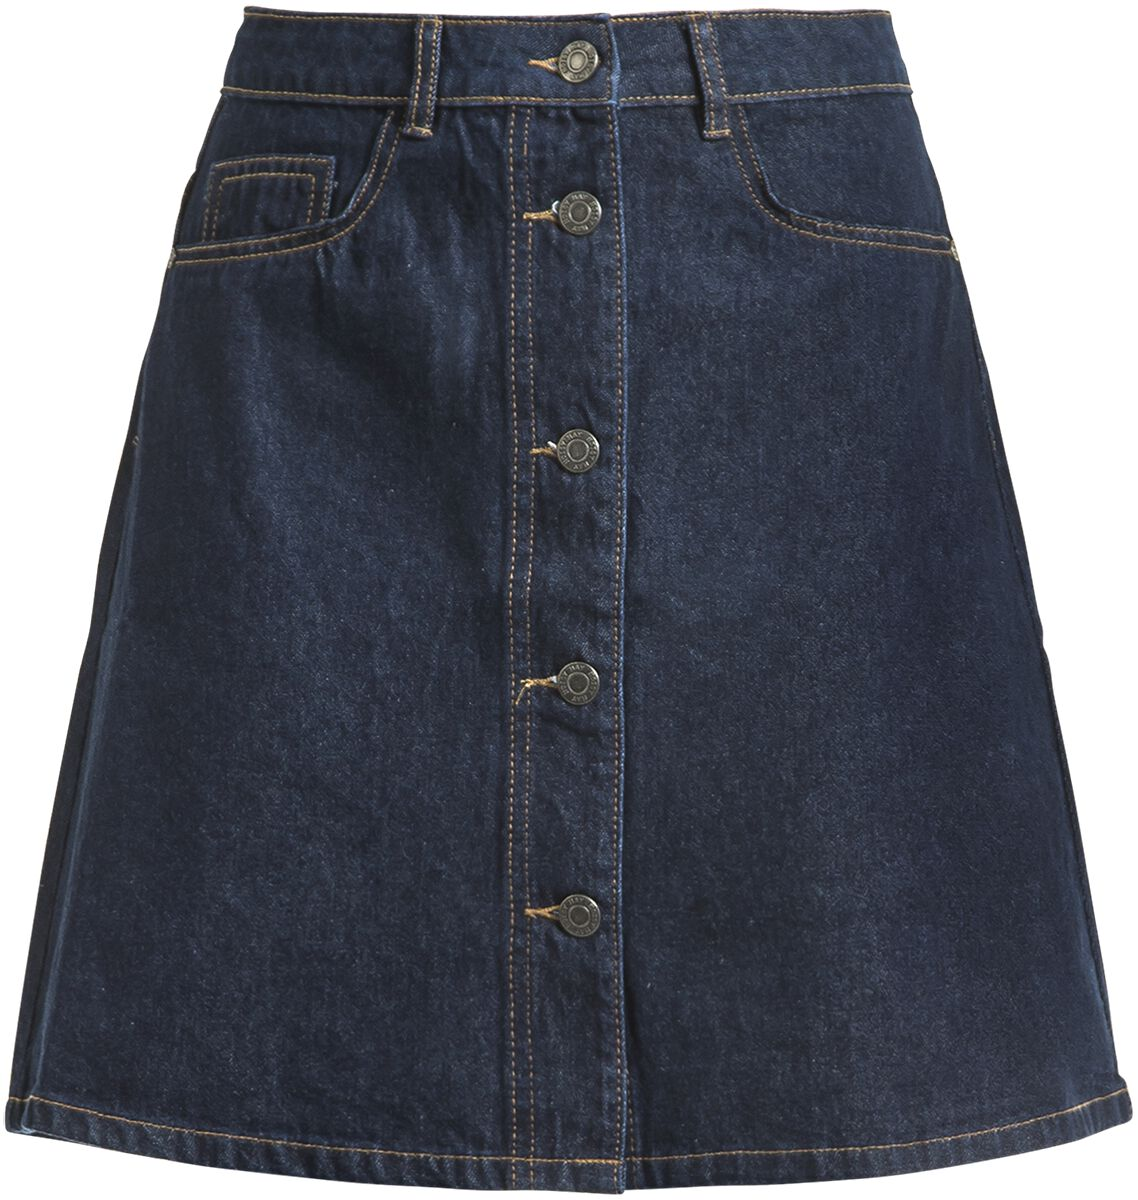 Roecke für Frauen - Noisy May Sunny Shortdenim Skater Skirt Mittellanger Rock dunkelblau  - Onlineshop EMP